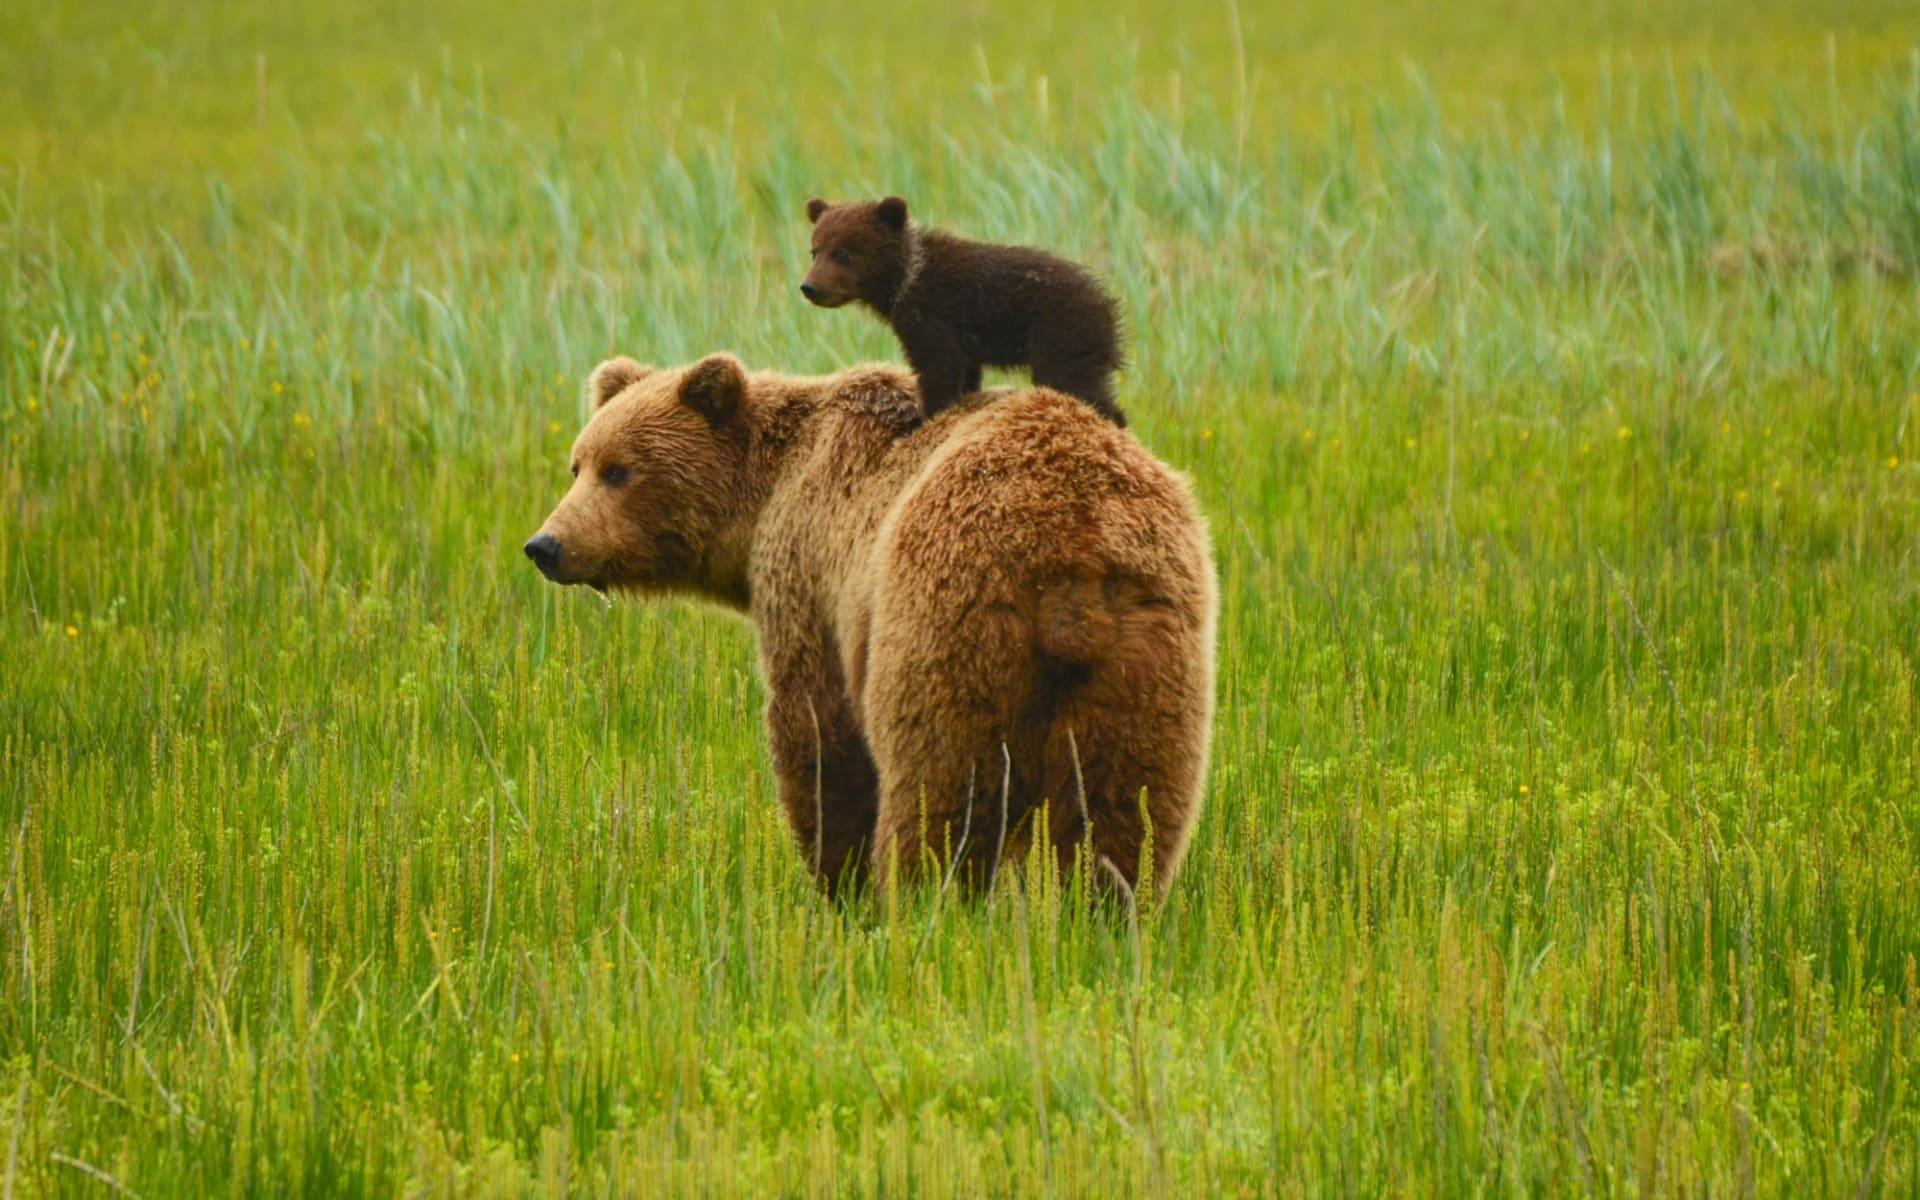 Okwari Tierbeobachtung ab La Baie: